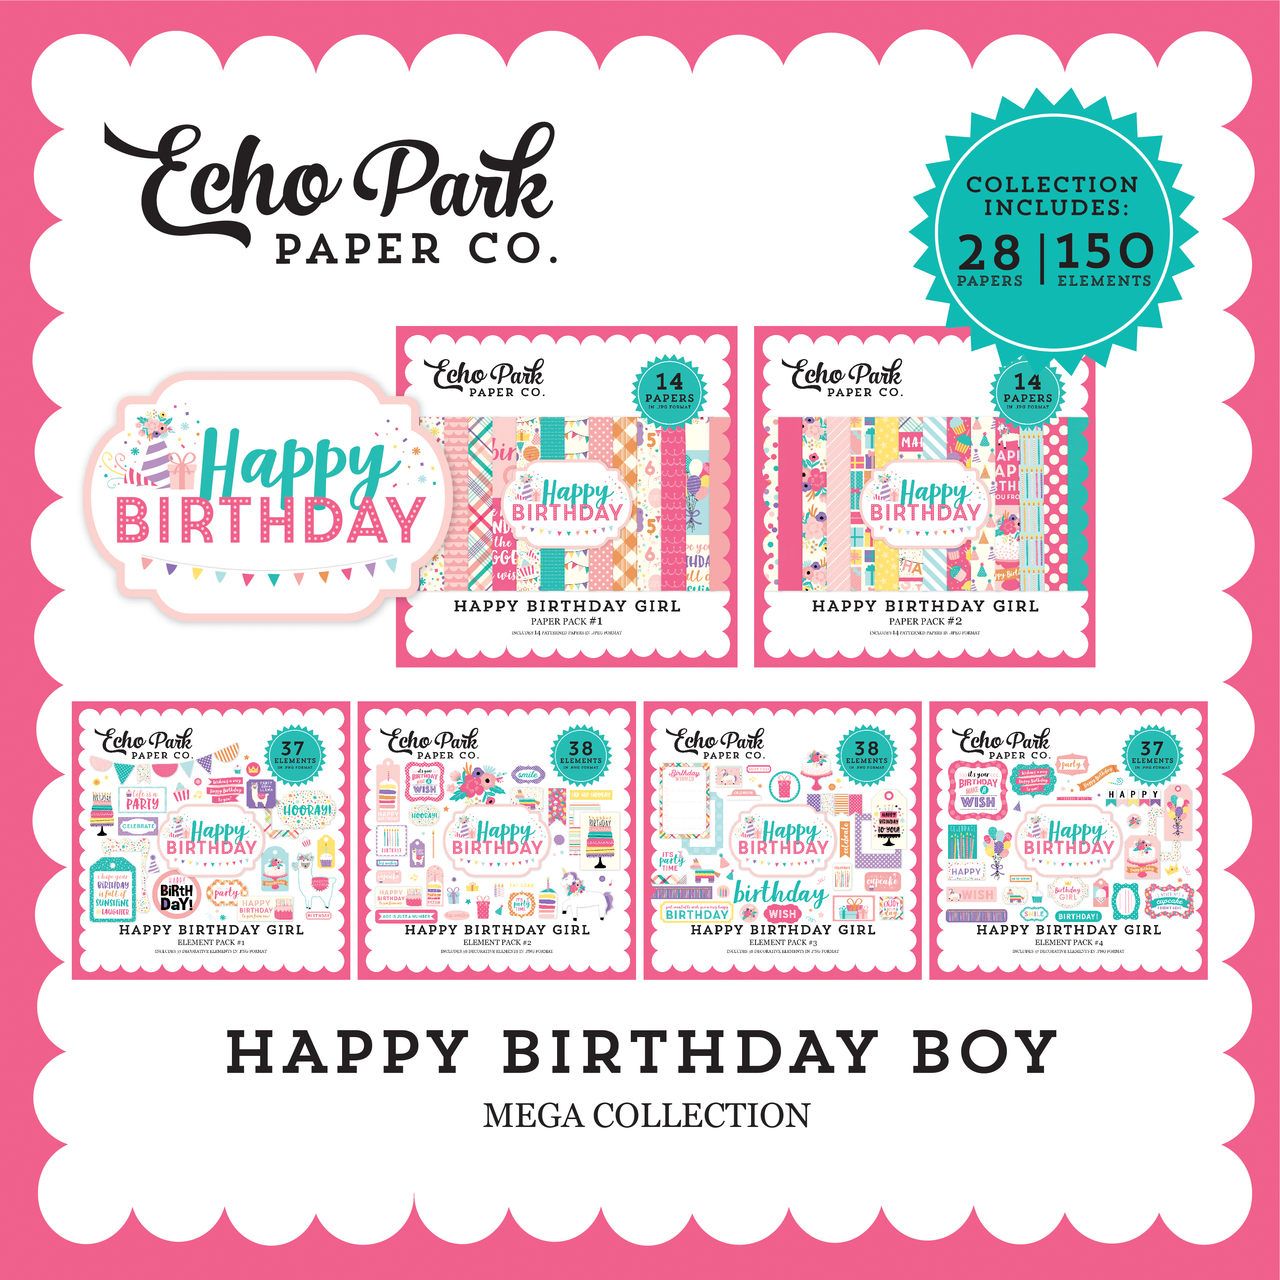 Happy Birthday Girl Mega Collection